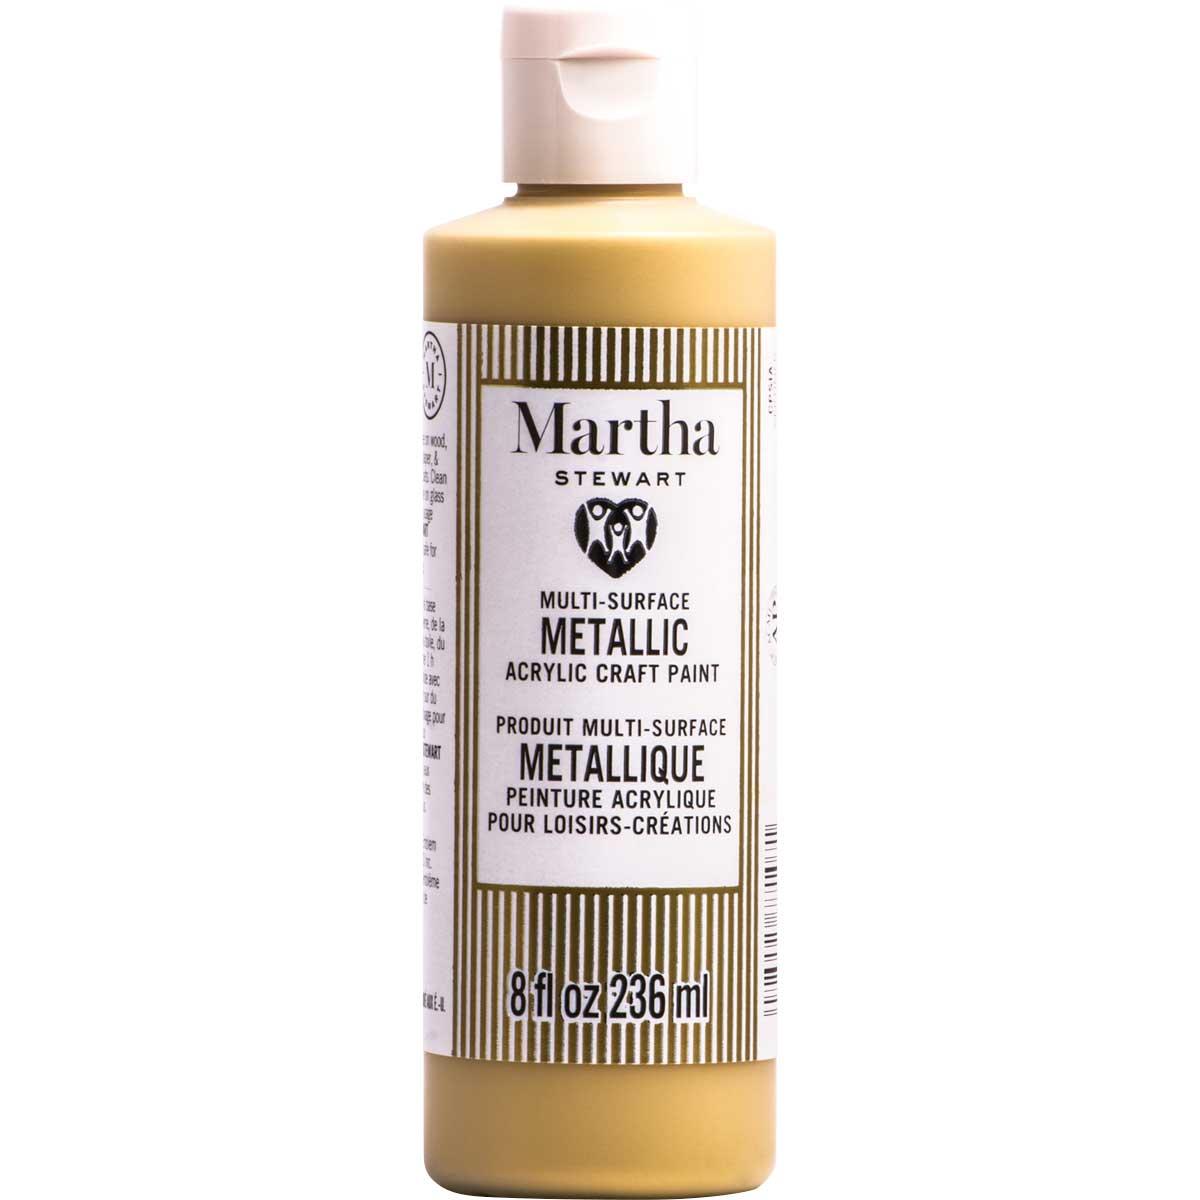 Martha Stewart ® Multi-Surface Metallic Acrylic Craft Paint CPSIA - Royal Gold, 8 oz.